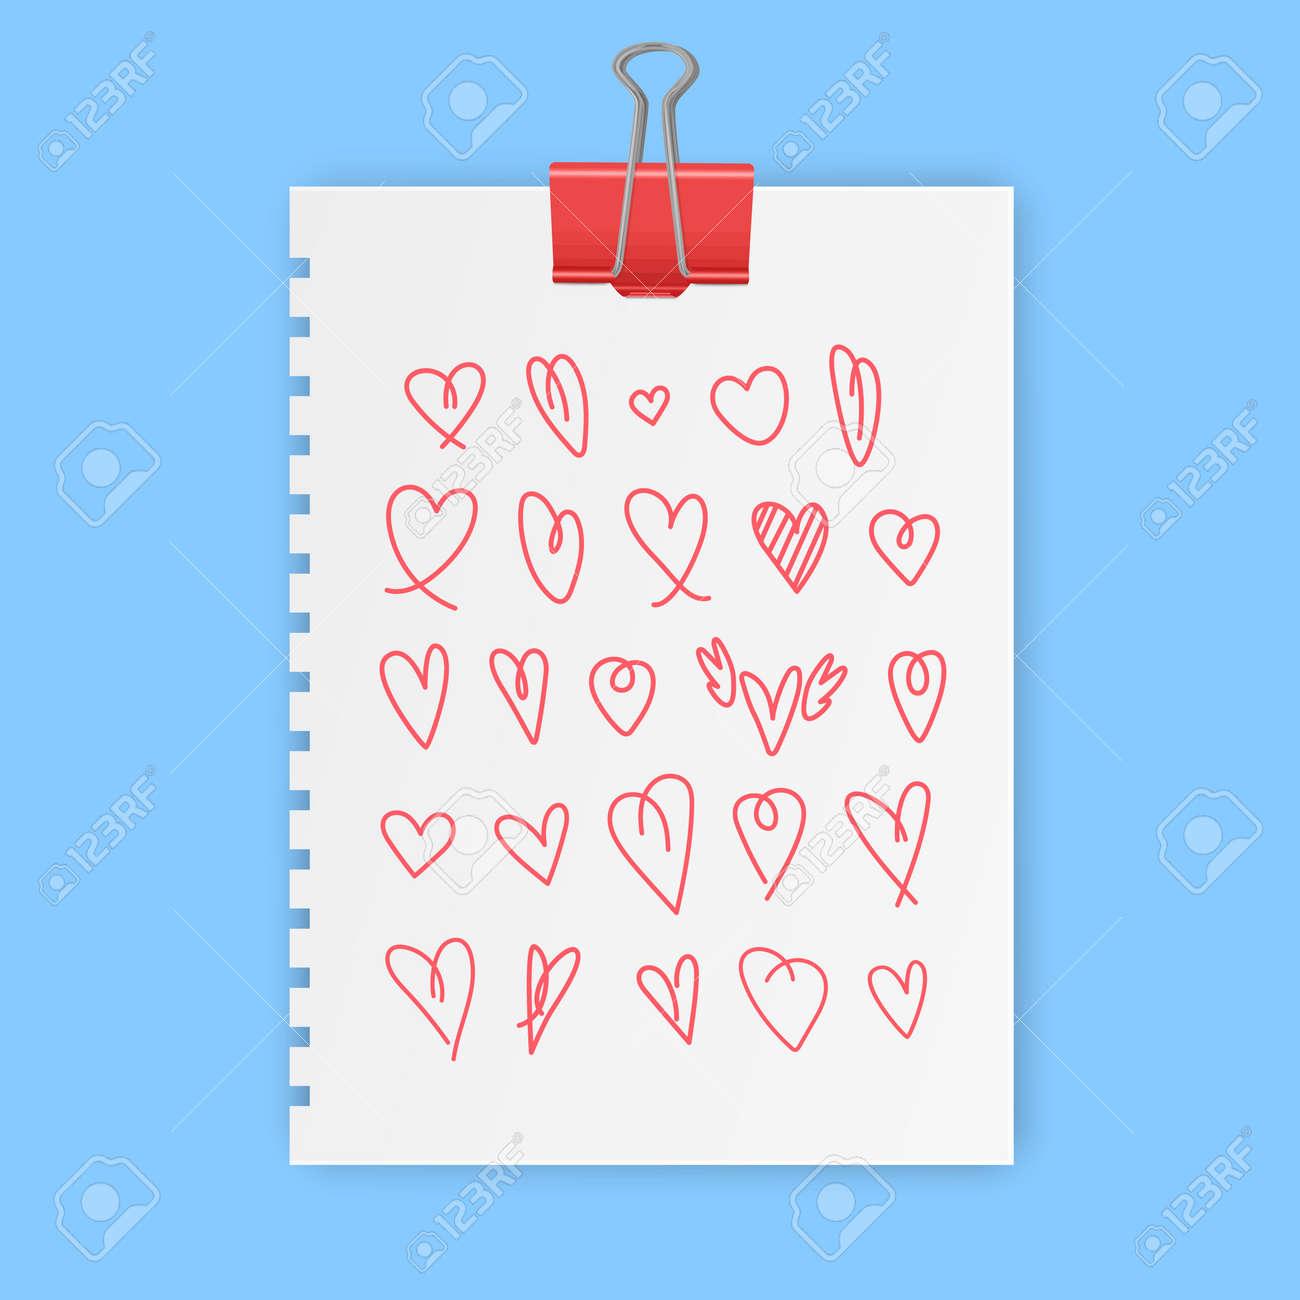 hand drawn heart sign vector, love symbols set illustration, doodle love icon set in vector format - 172322941